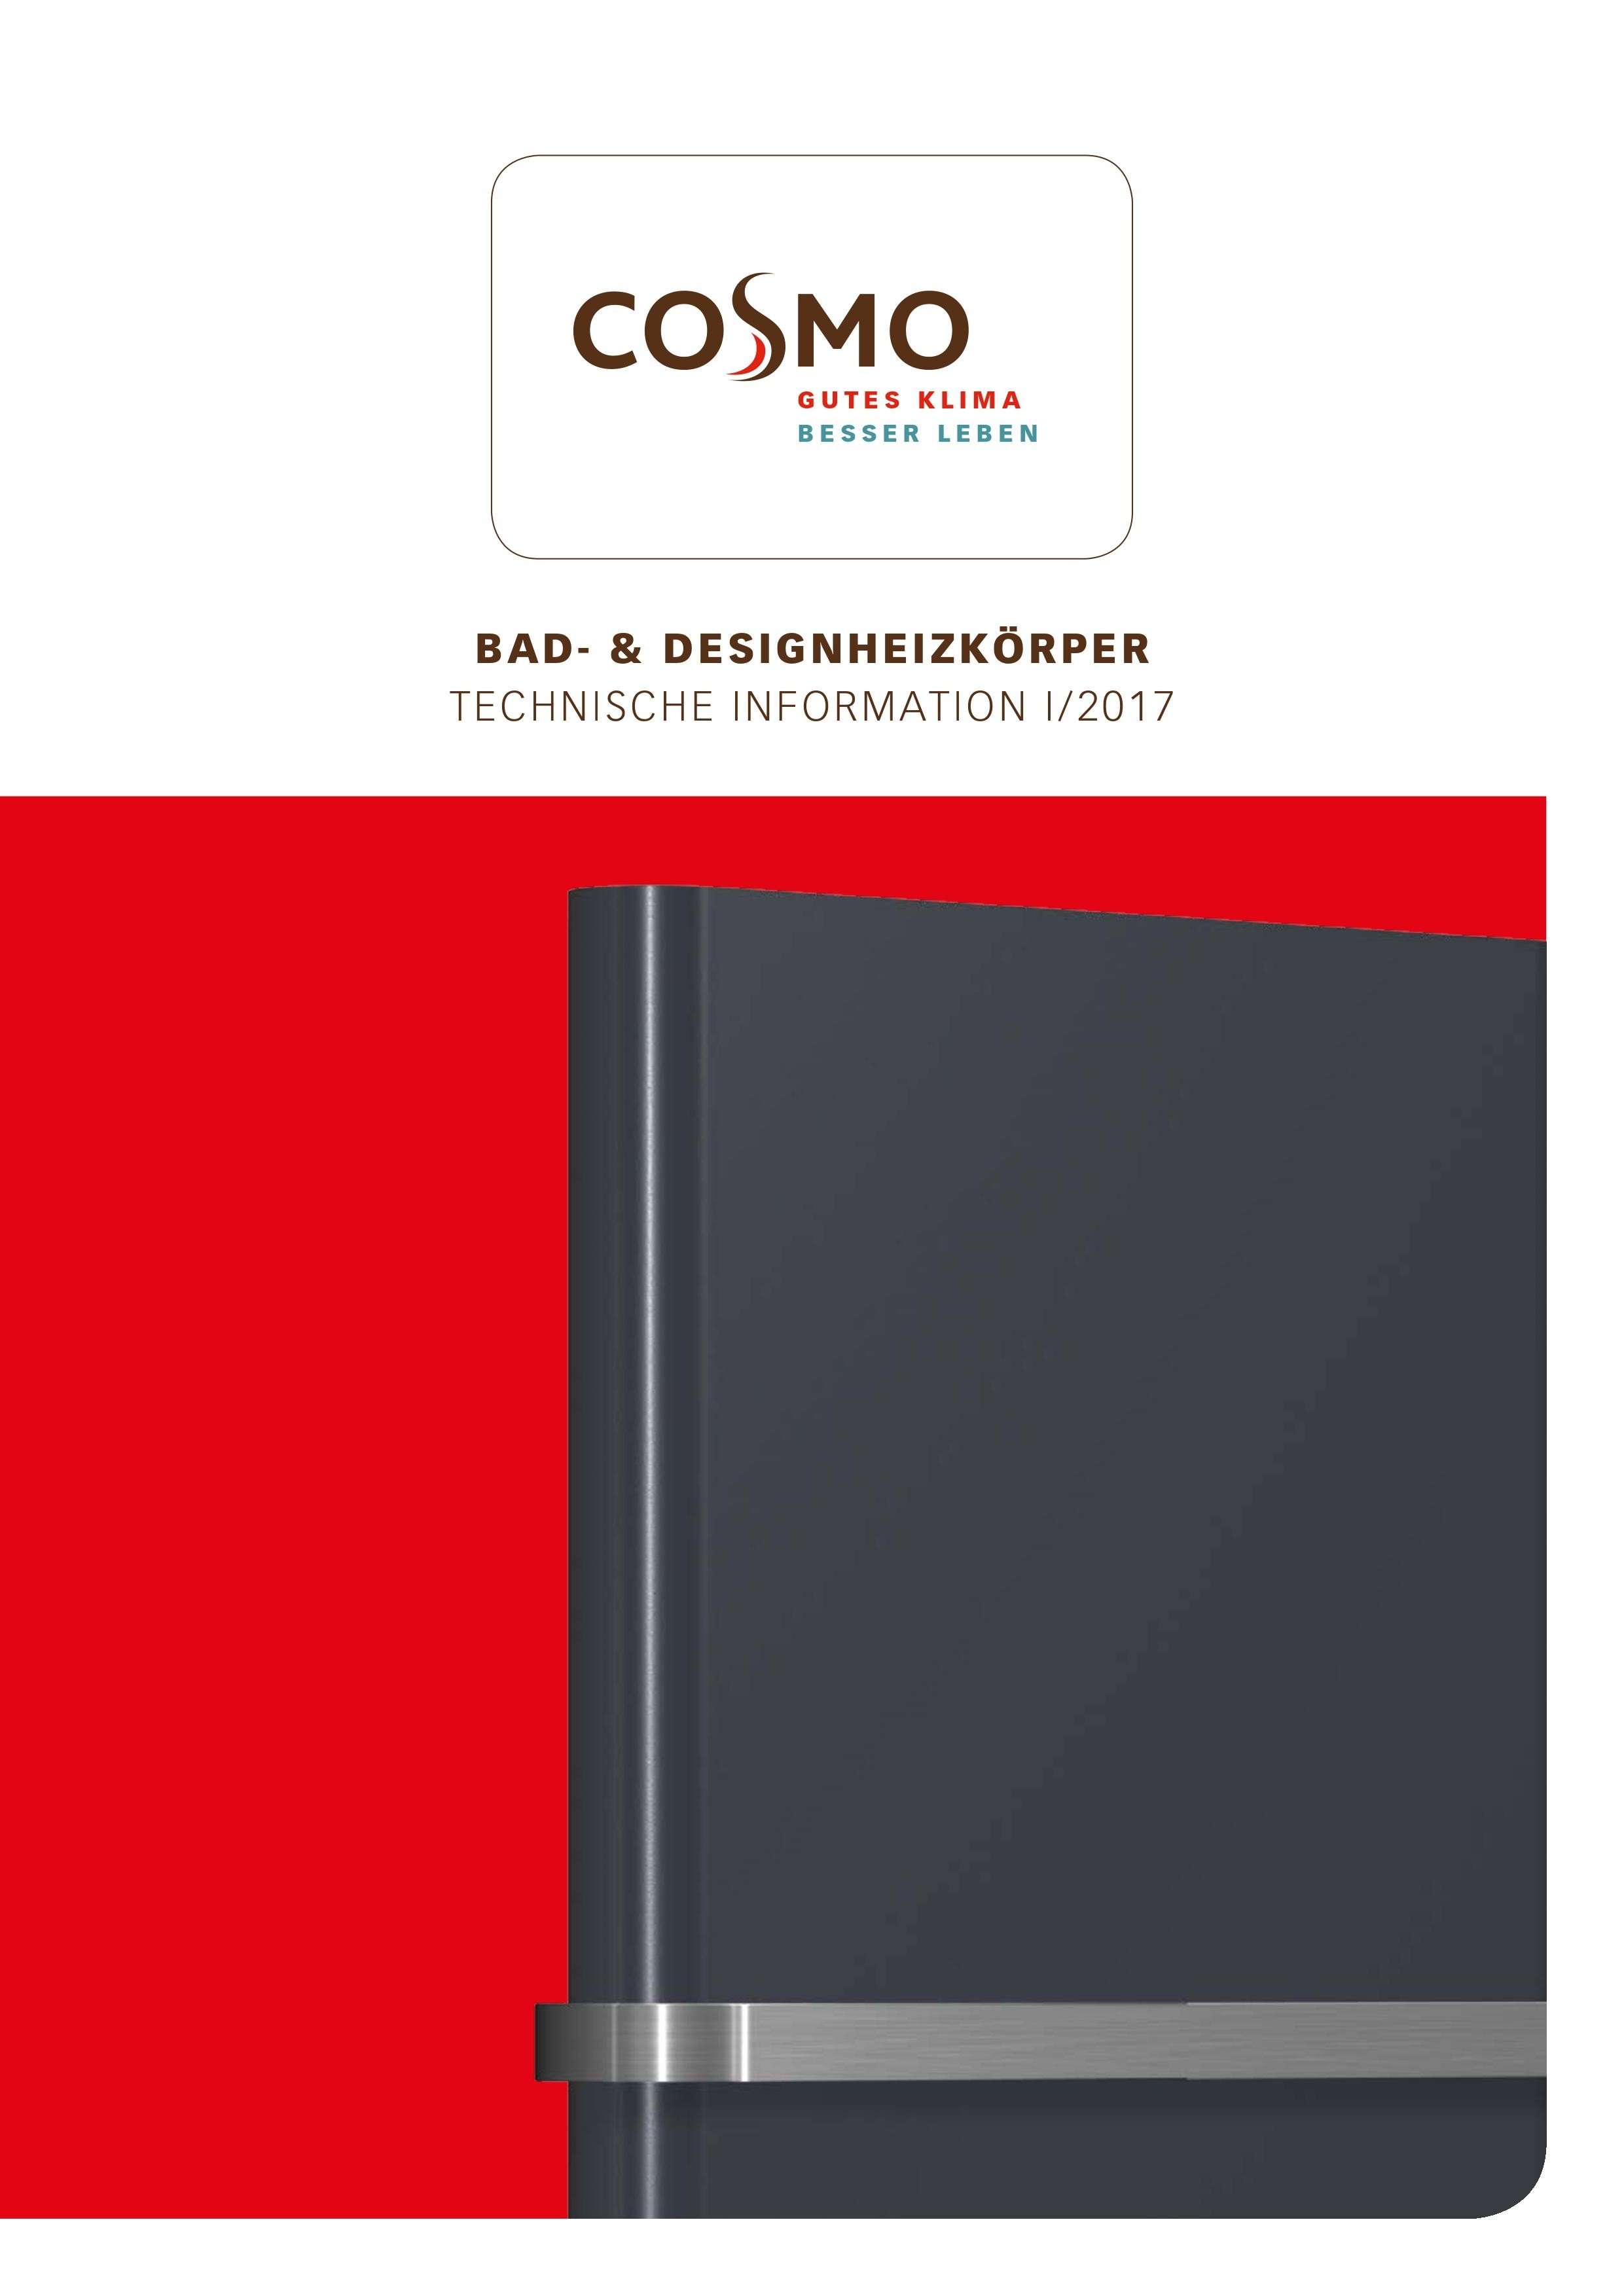 cosmo technik bad designheizk rper 2017. Black Bedroom Furniture Sets. Home Design Ideas